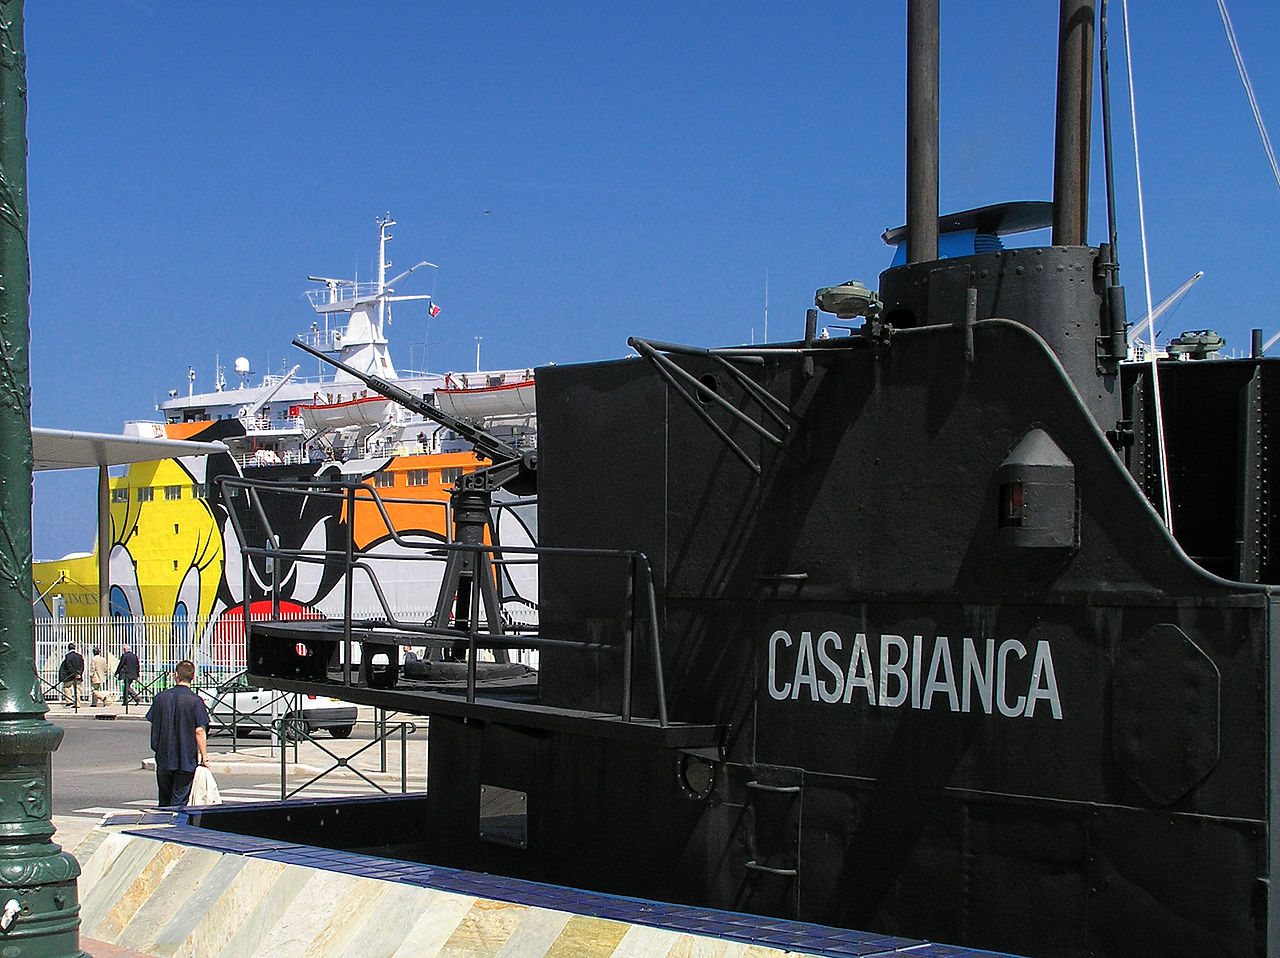 1280px-Bastia-Sous-marin_Casabianca.jpg